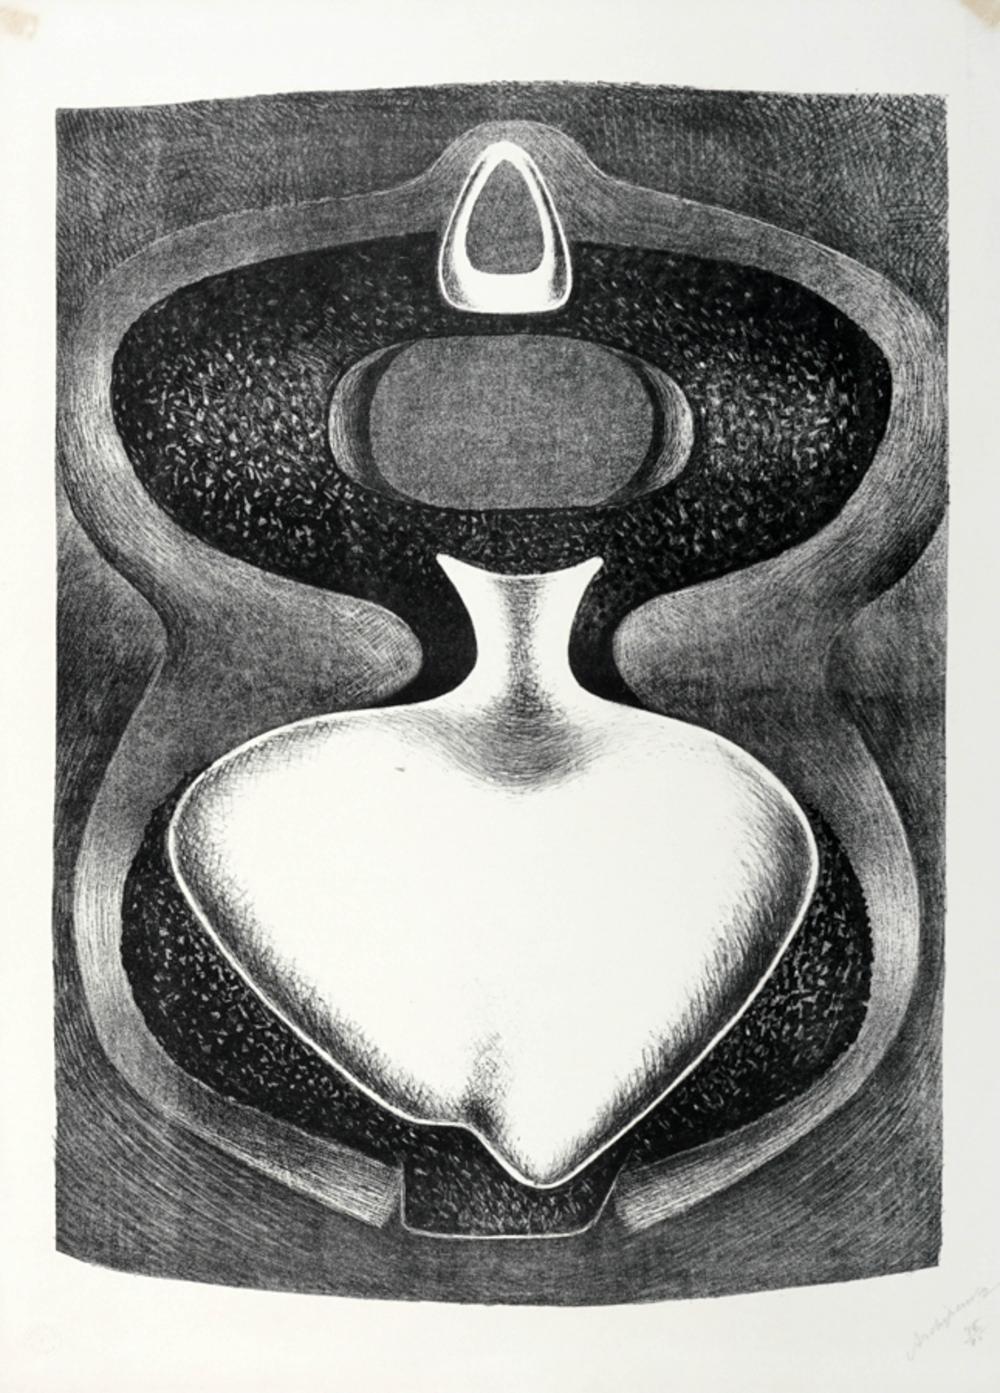 Alexander Archipenko, Les formes majestueuses.